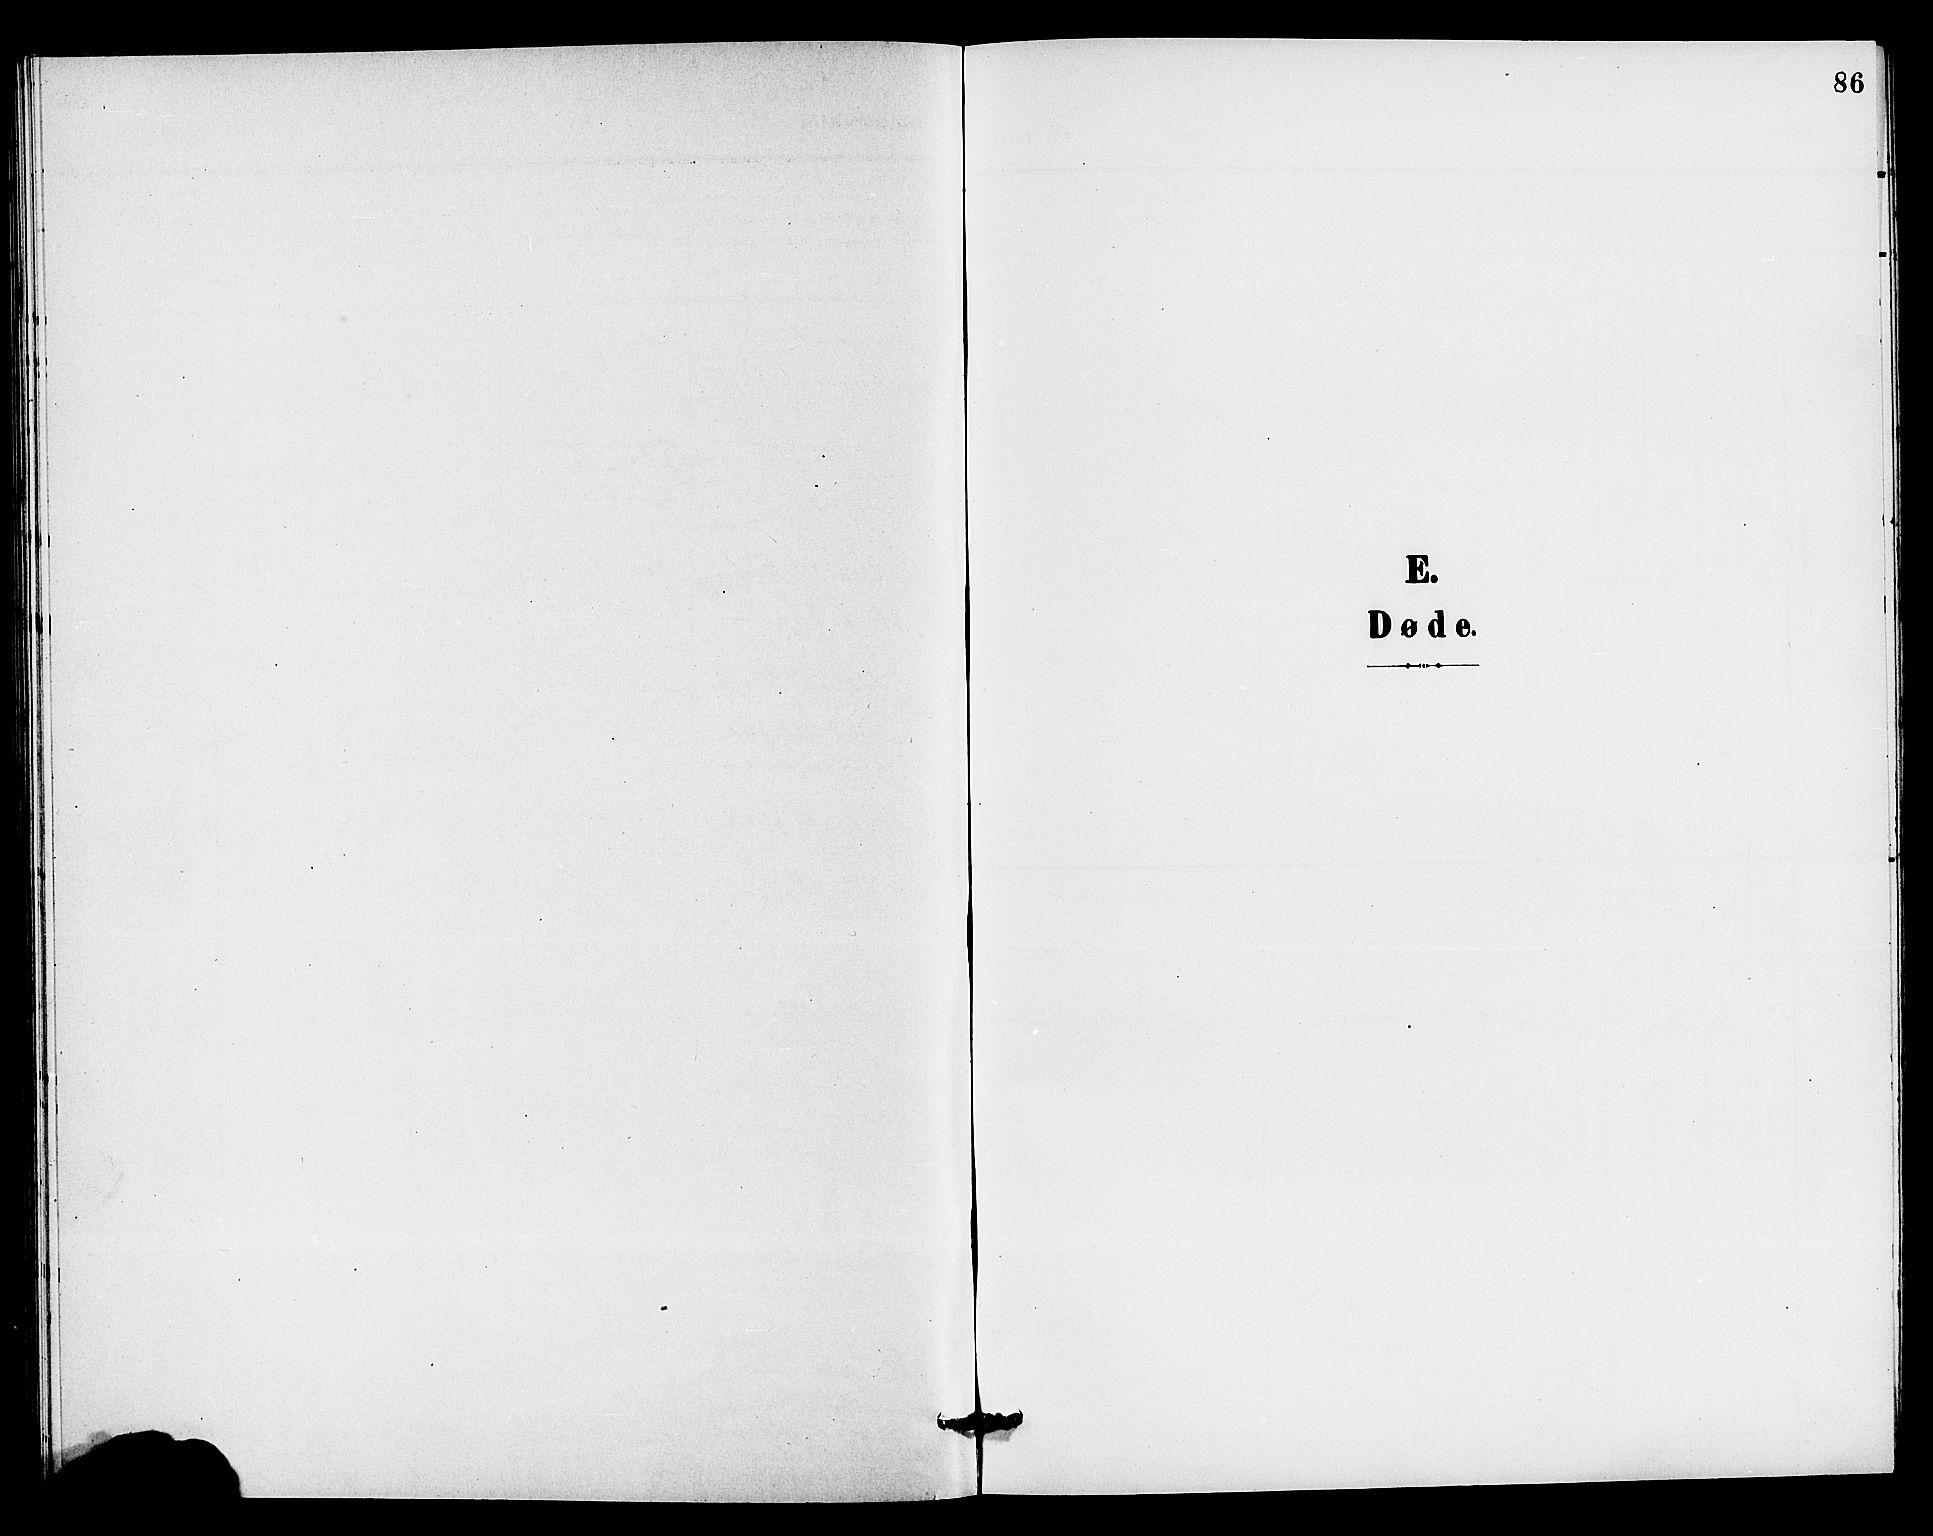 SAKO, Holla kirkebøker, G/Gb/L0002: Klokkerbok nr. II 2, 1897-1913, s. 86